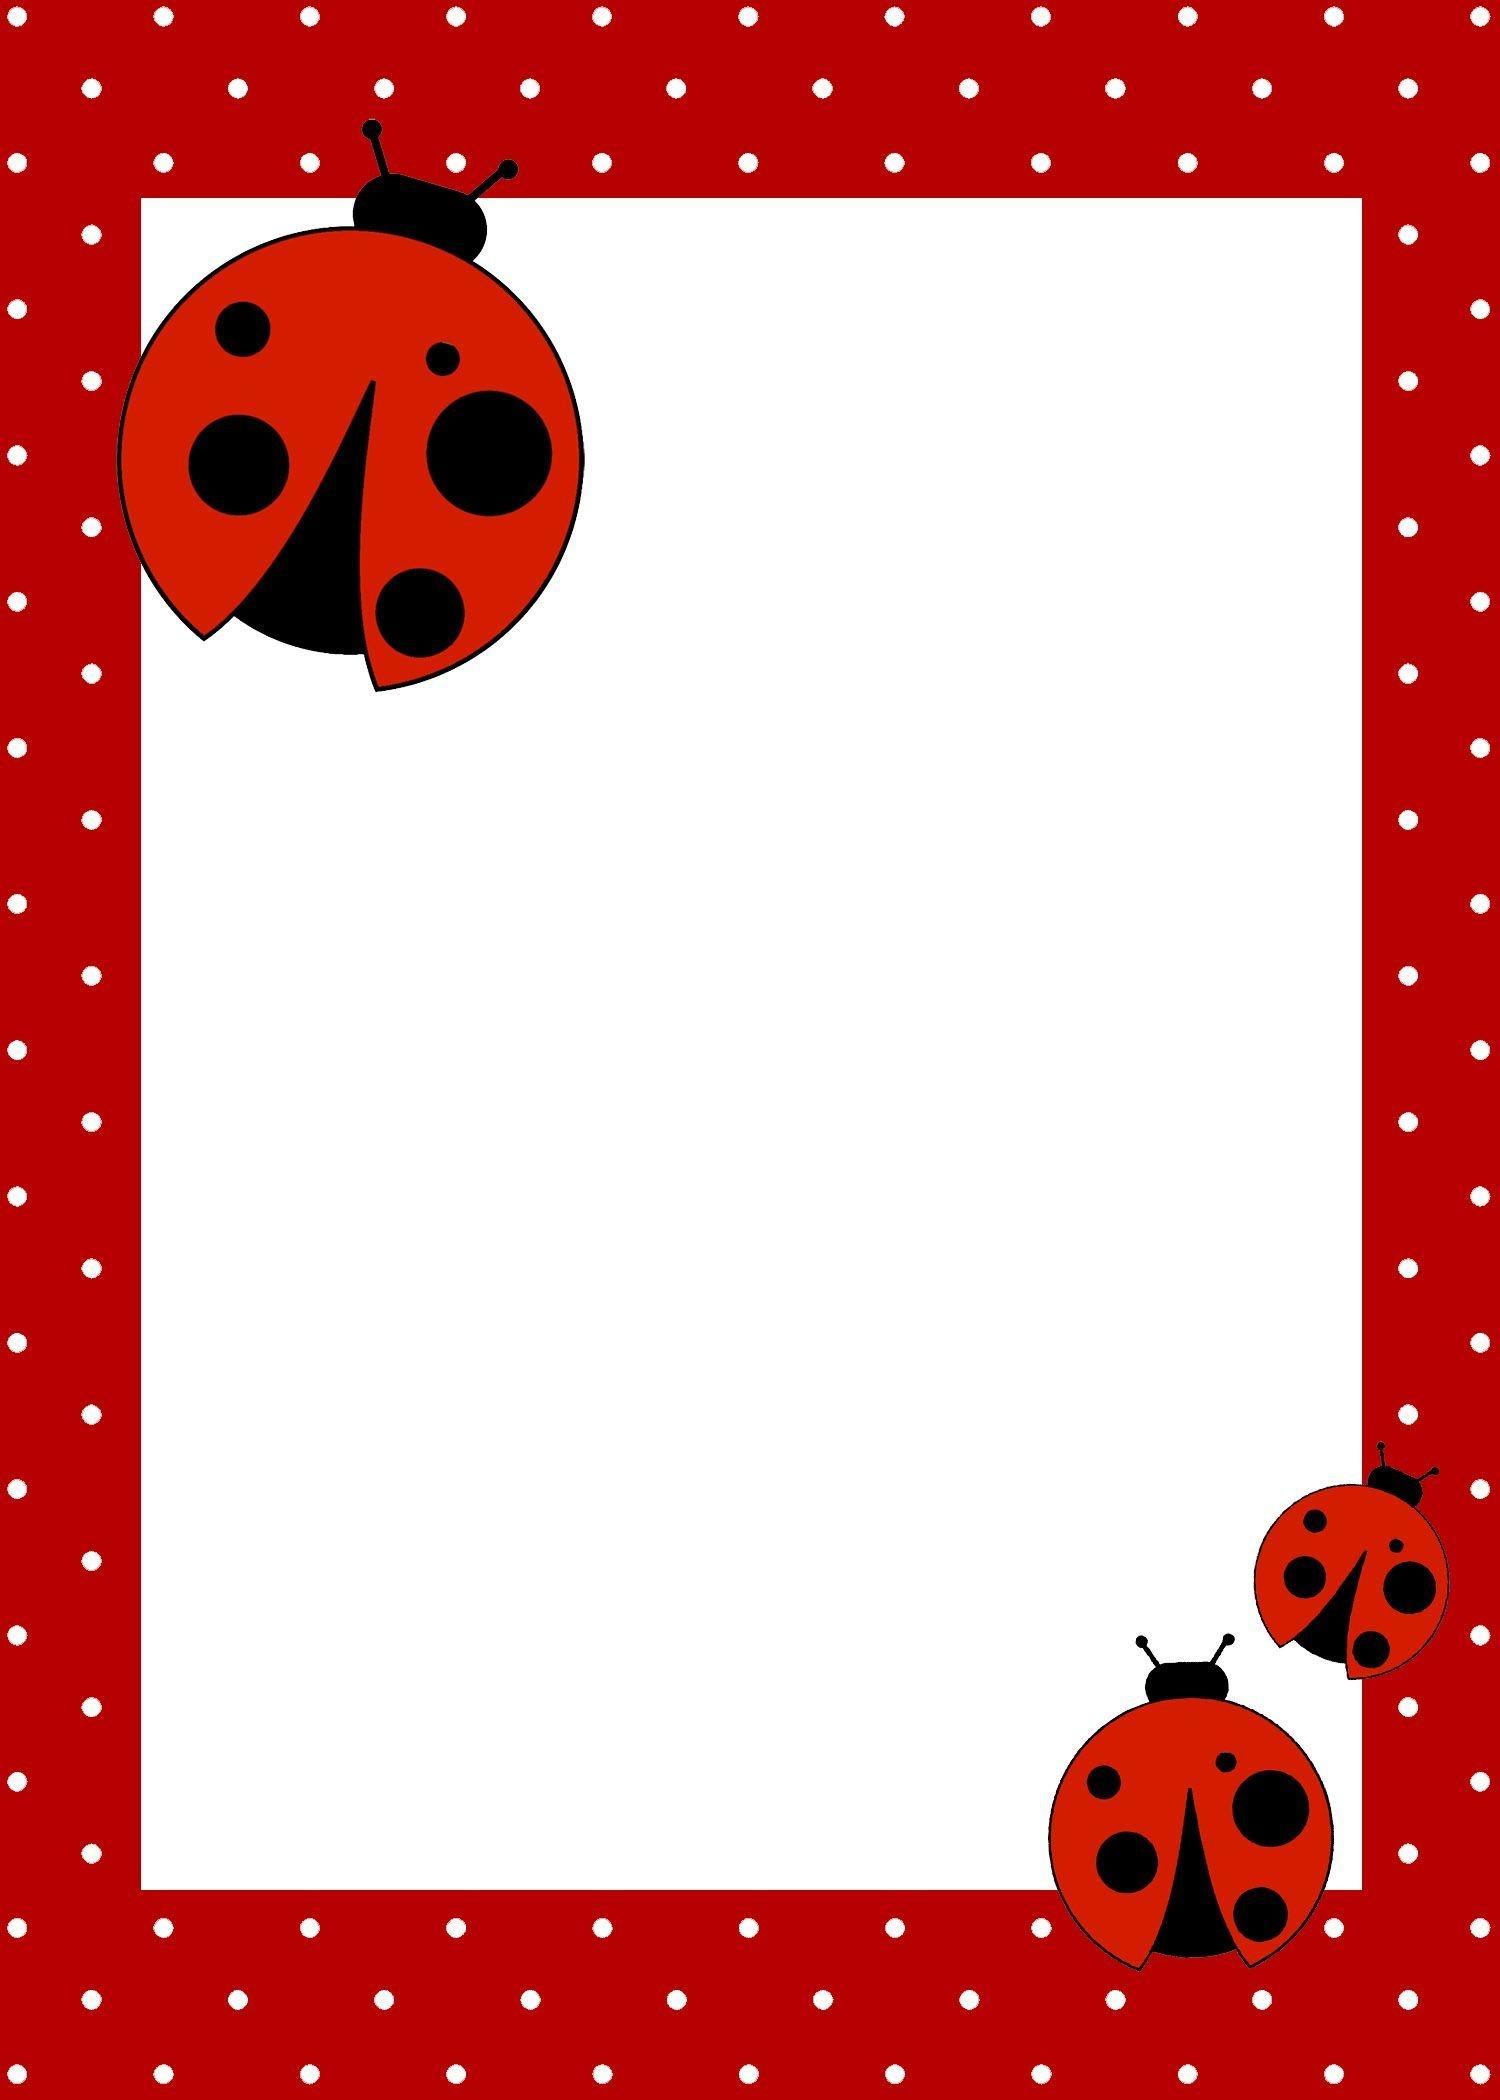 Ladybug Baby Shower Invitations Unique Birthday Free Template - Free Printable Ladybug Baby Shower Invitations Templates